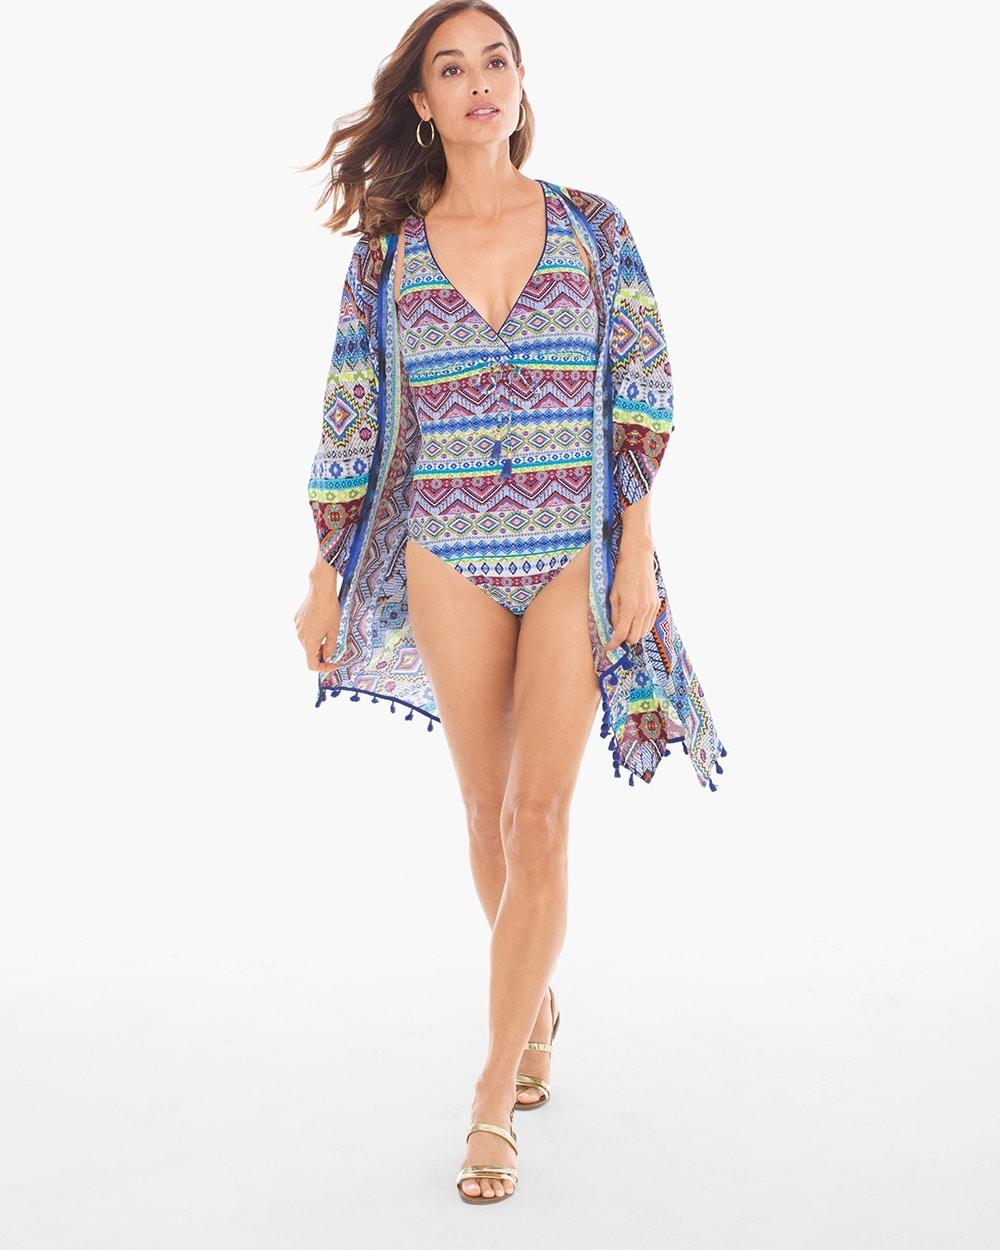 6ce35eed78 Return to thumbnail image selection Tapmastery Swim Cover-up Kimono